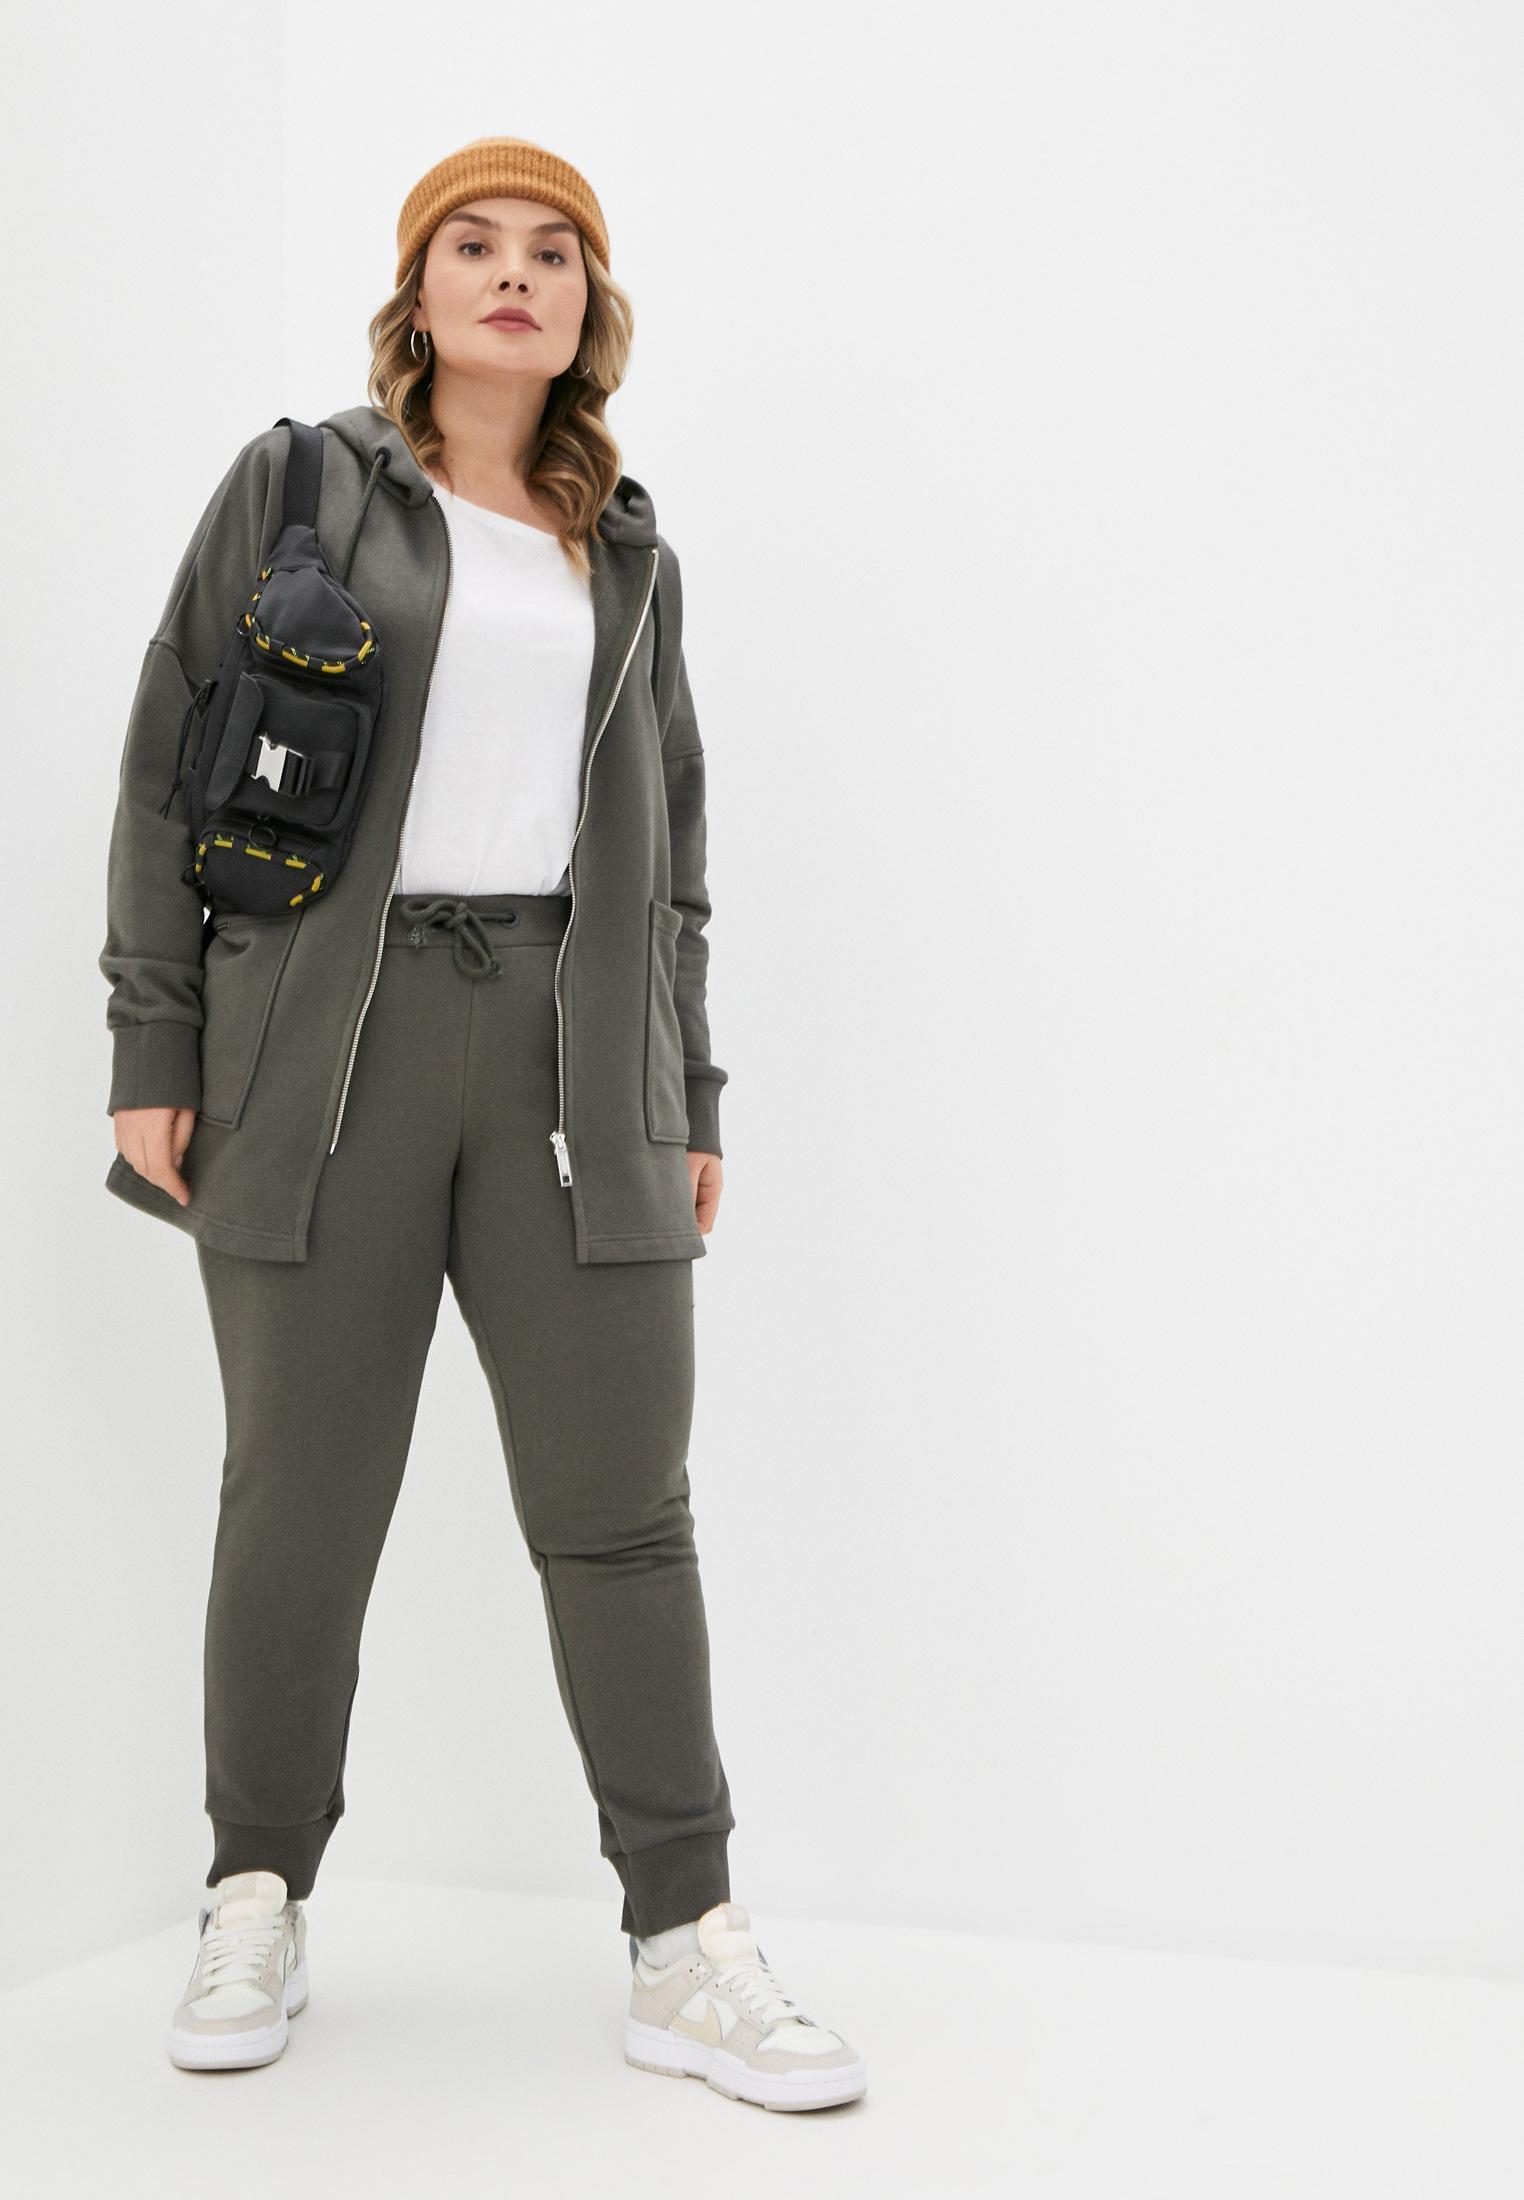 Спортивный костюм Sitlly 21702